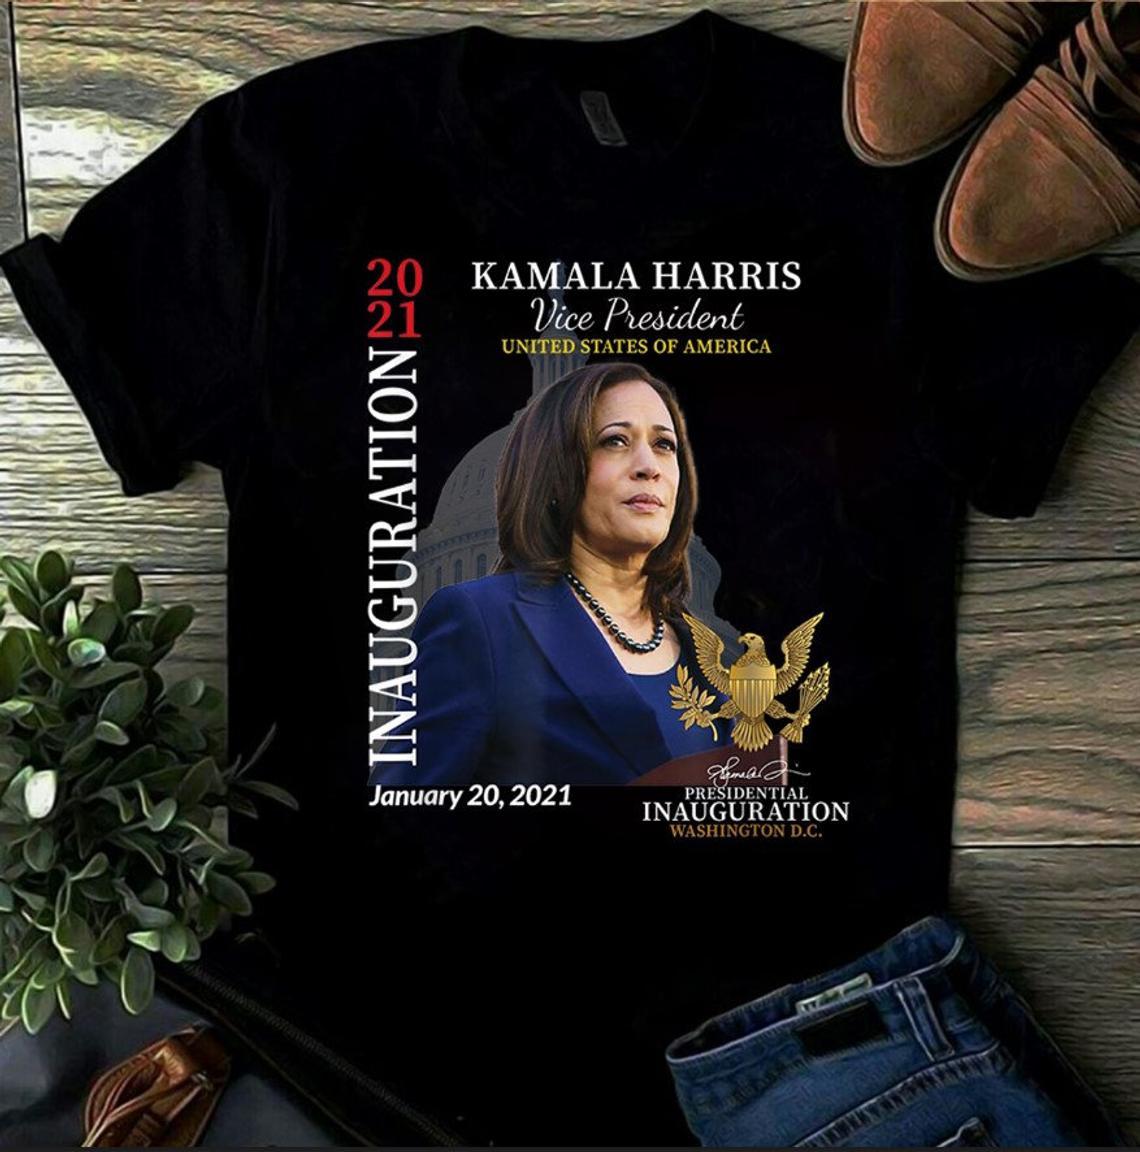 Kamala Harris 2021 Inauguration Day Commemorative Souvenir T-Shirt, Biden Harris Shirt, 46th President Shirt, Joe Biden Shirt